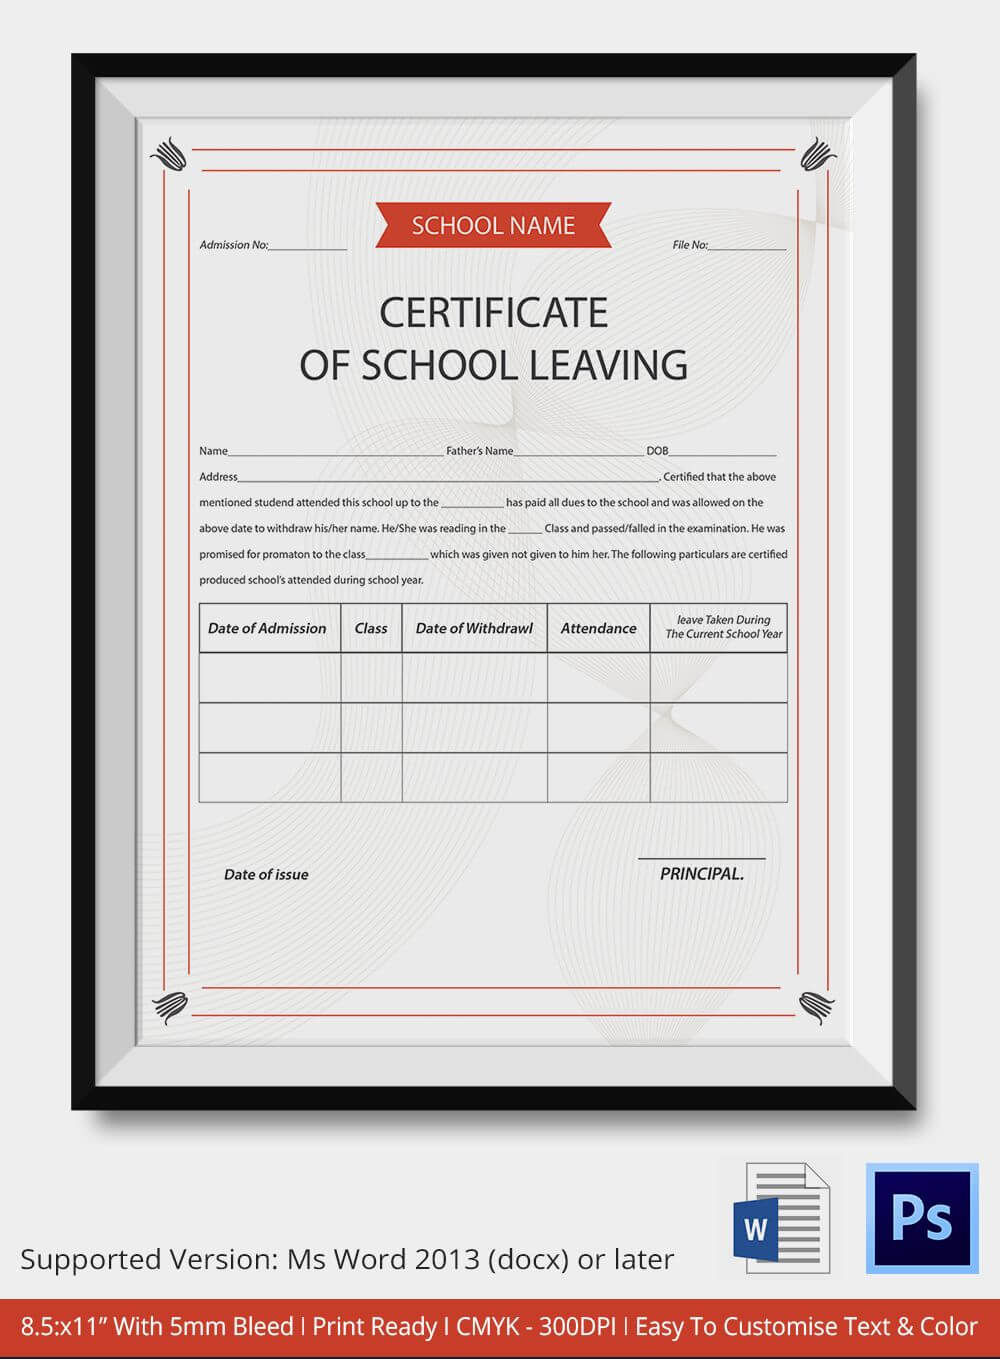 School Leaving Certificate Template | Certificate Templates Pertaining To School Leaving Certificate Template